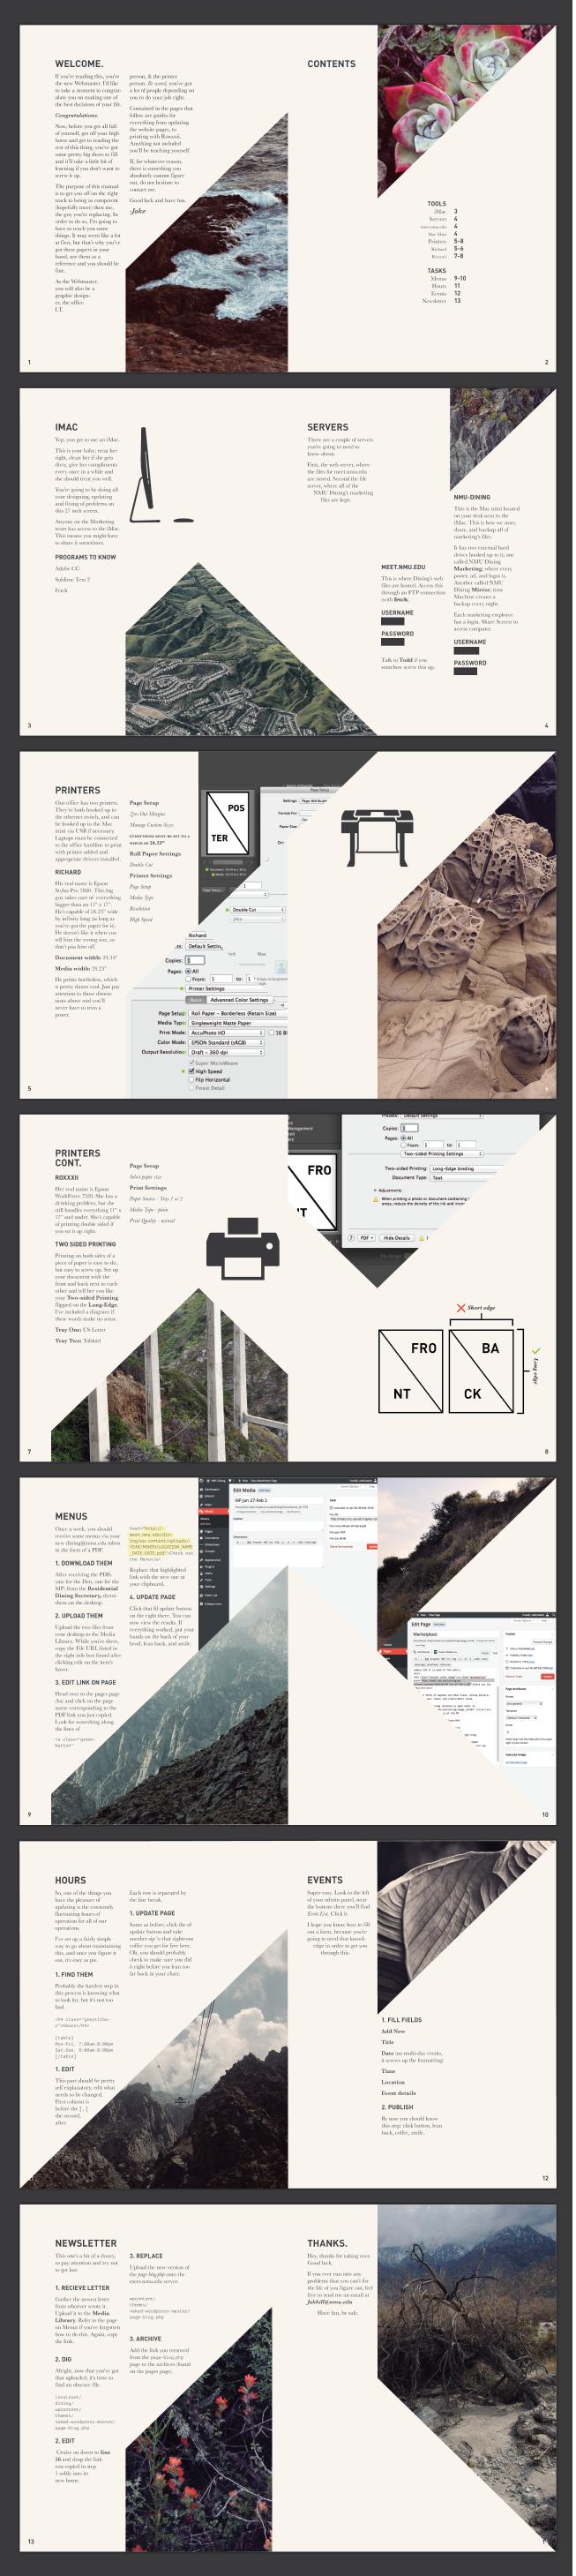 Halfpixels_Webmaster_Manual.png by Jake Hill